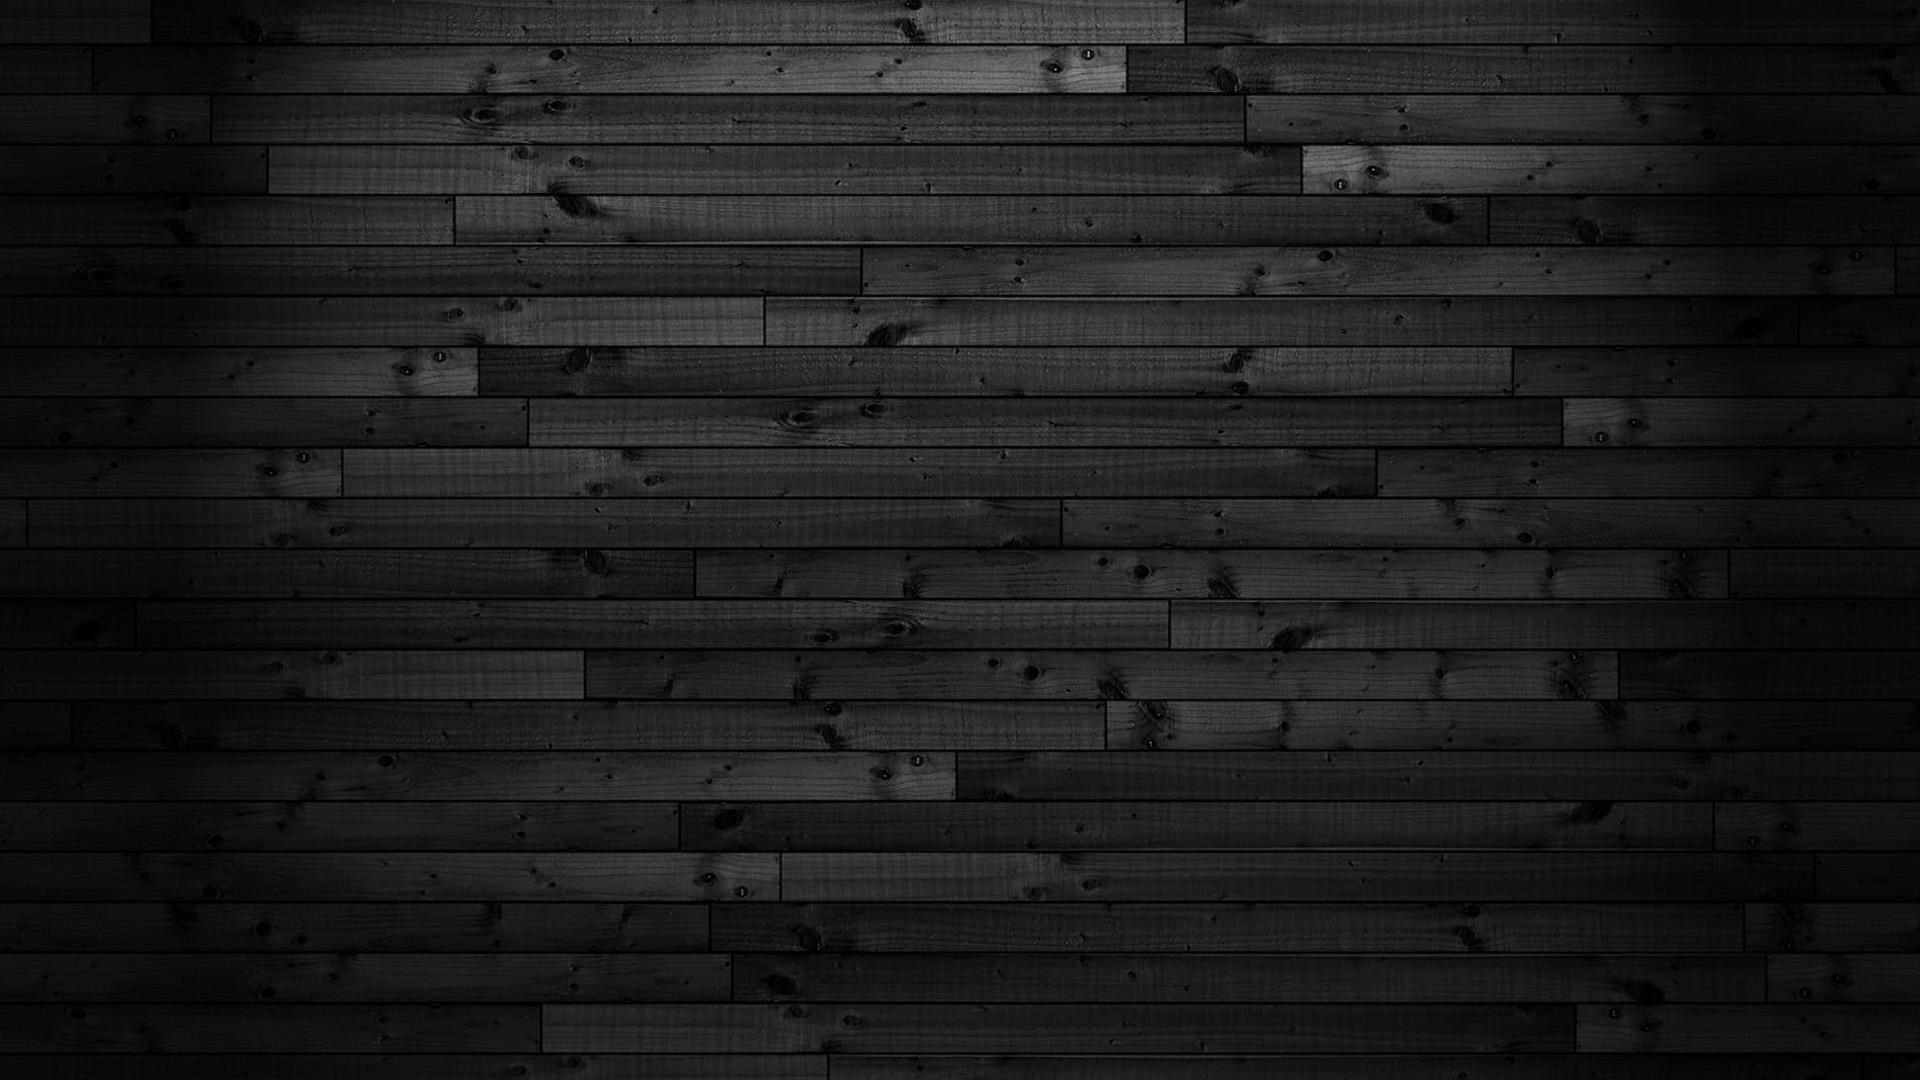 Black-wooden-wall-HD-1920x1080-1920%C3%971080-wallpaper-wp3603459